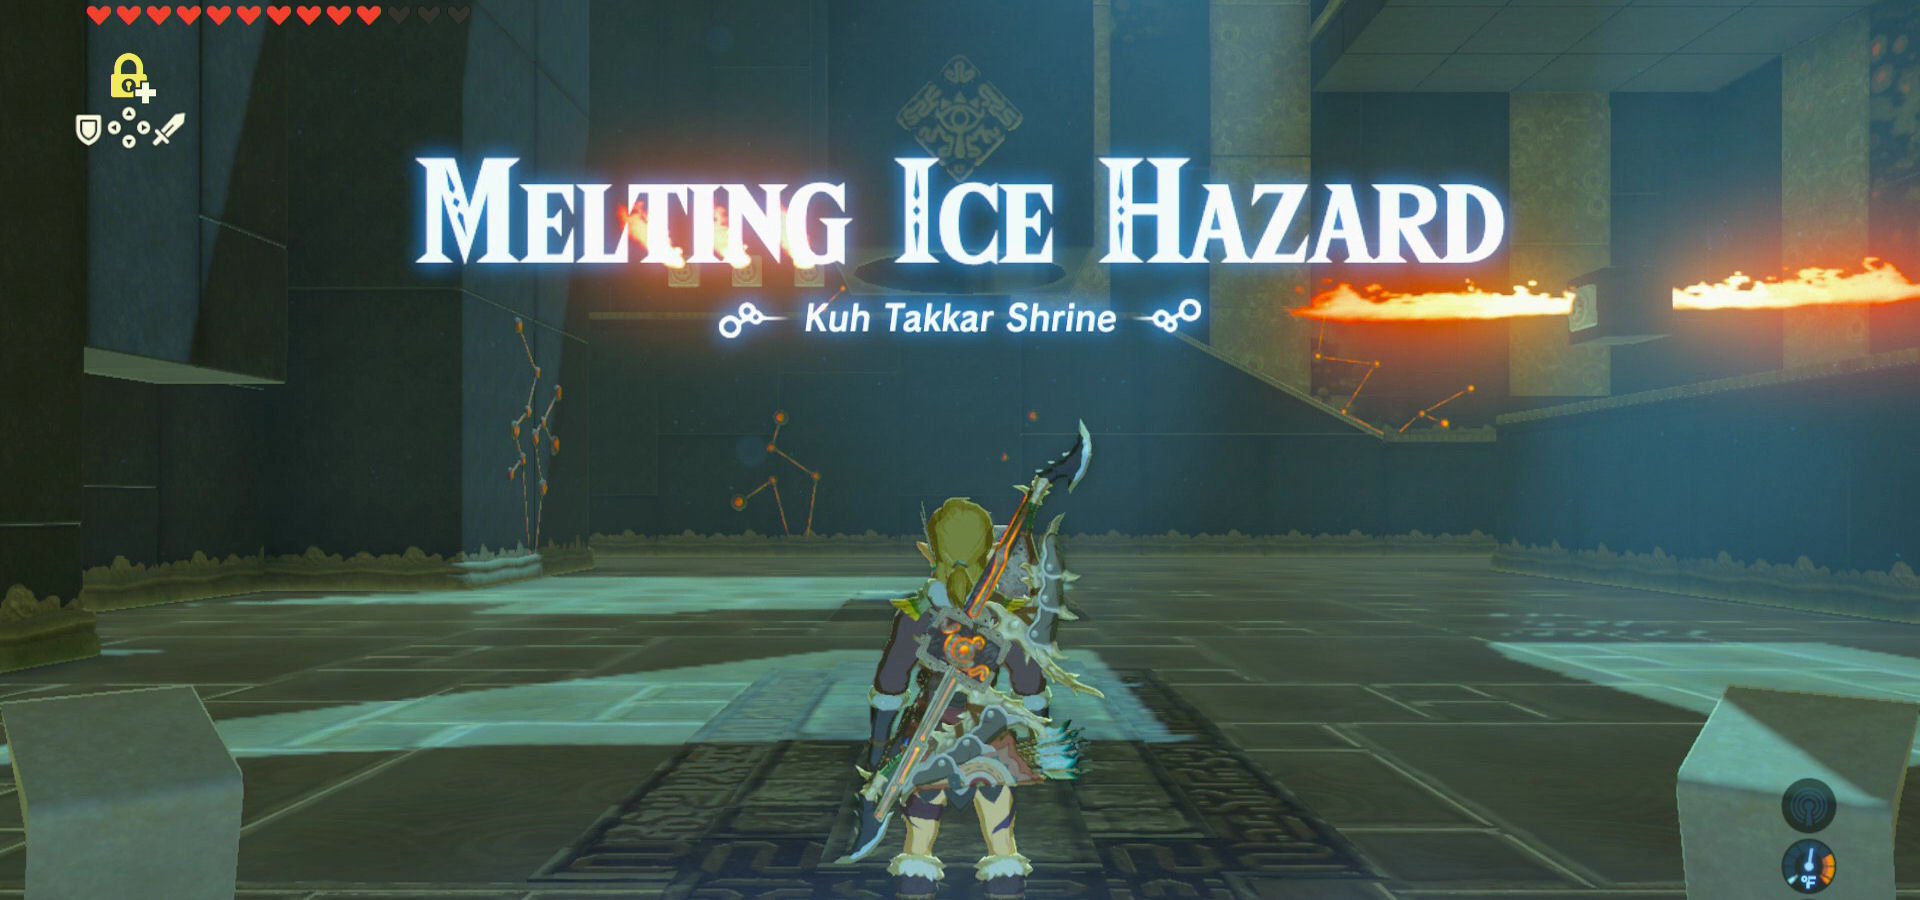 Kuh Takkar Shrine Guide - Zelda Dungeon